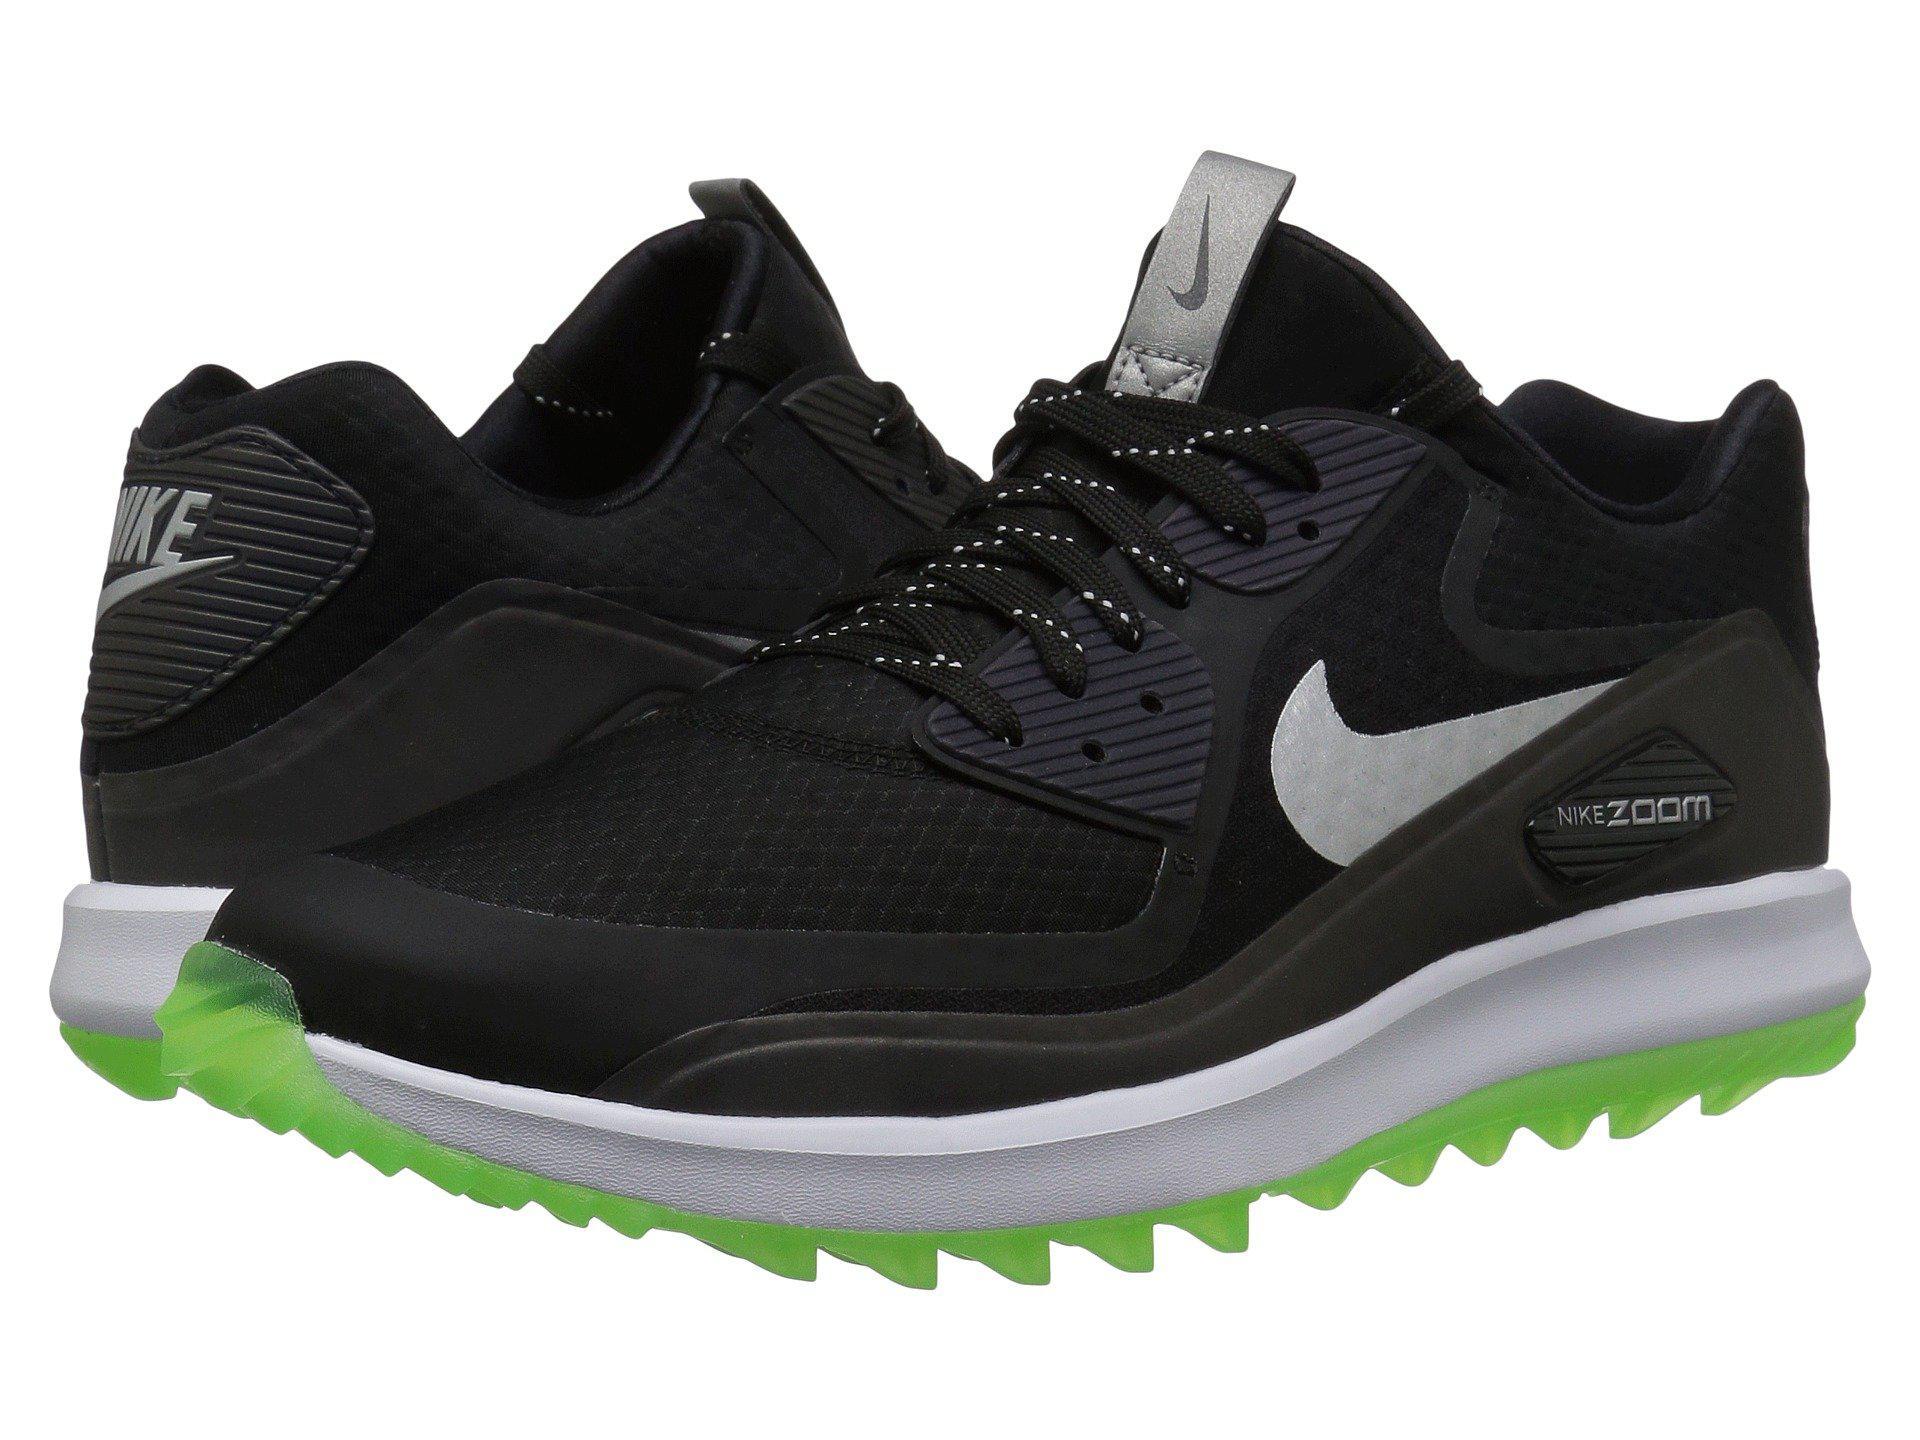 cef62d3d4eaf Lyst - Nike Zoom 90 It Ngc in Black for Men